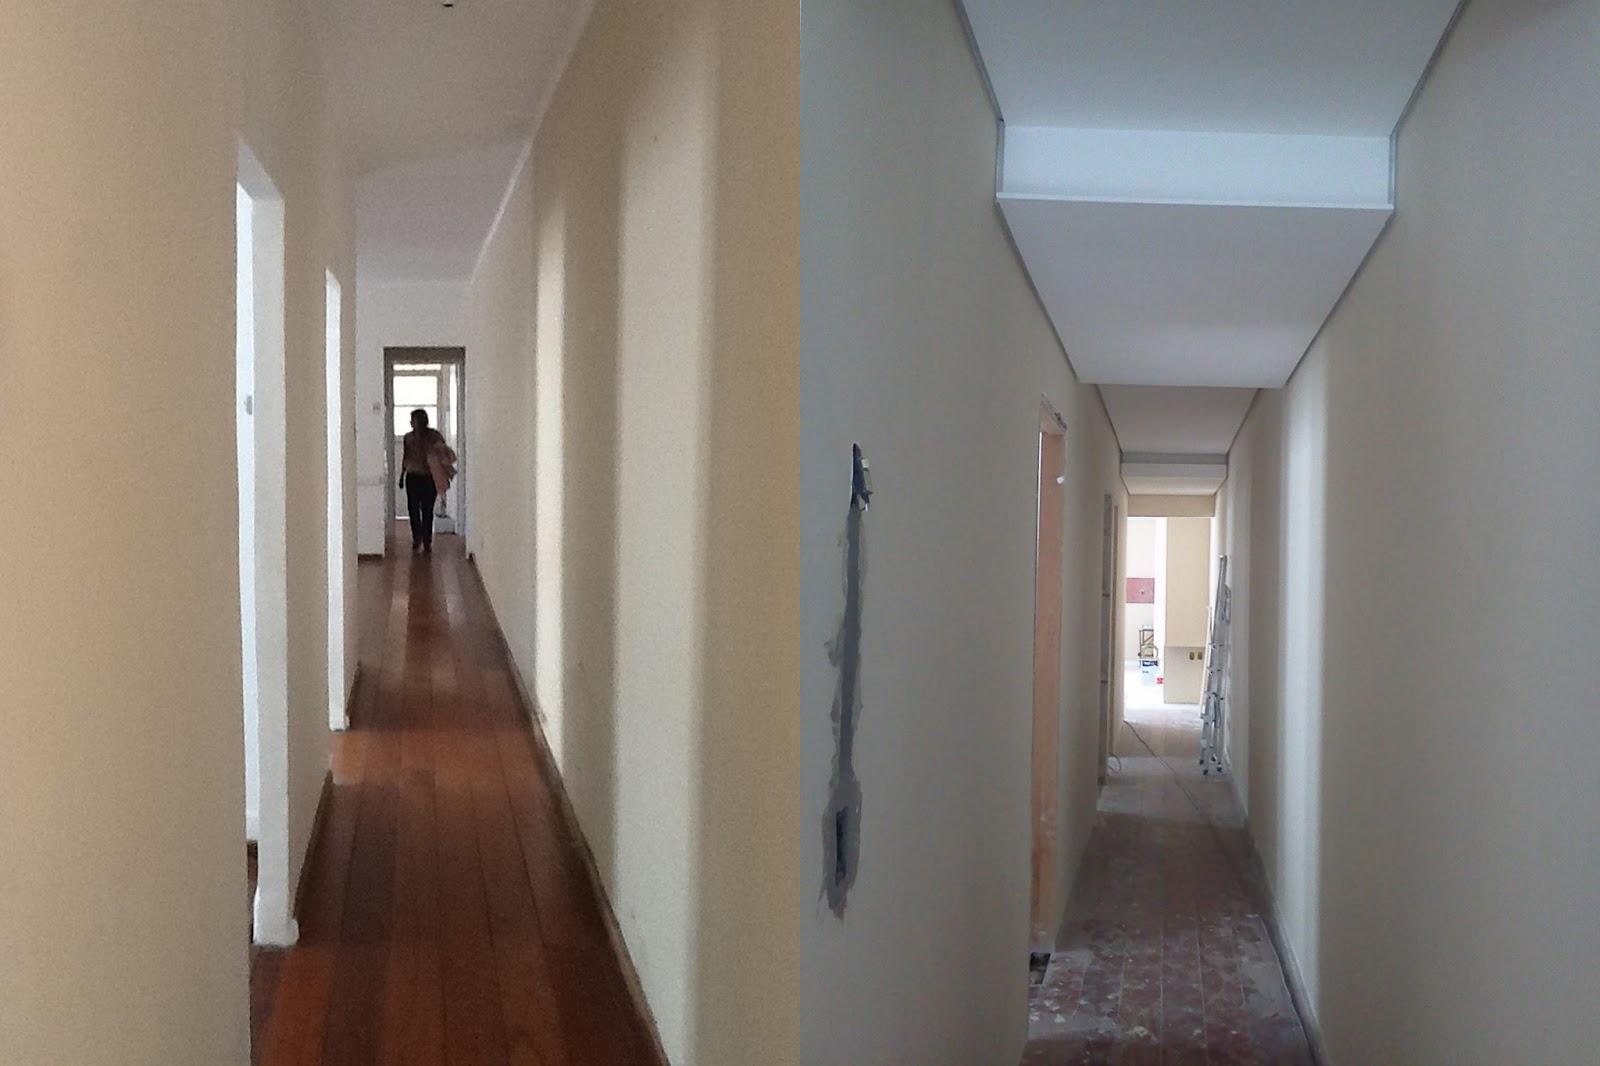 Reforma de casa antiga antes e durante arquitetando ideias - Reforma en casa ...